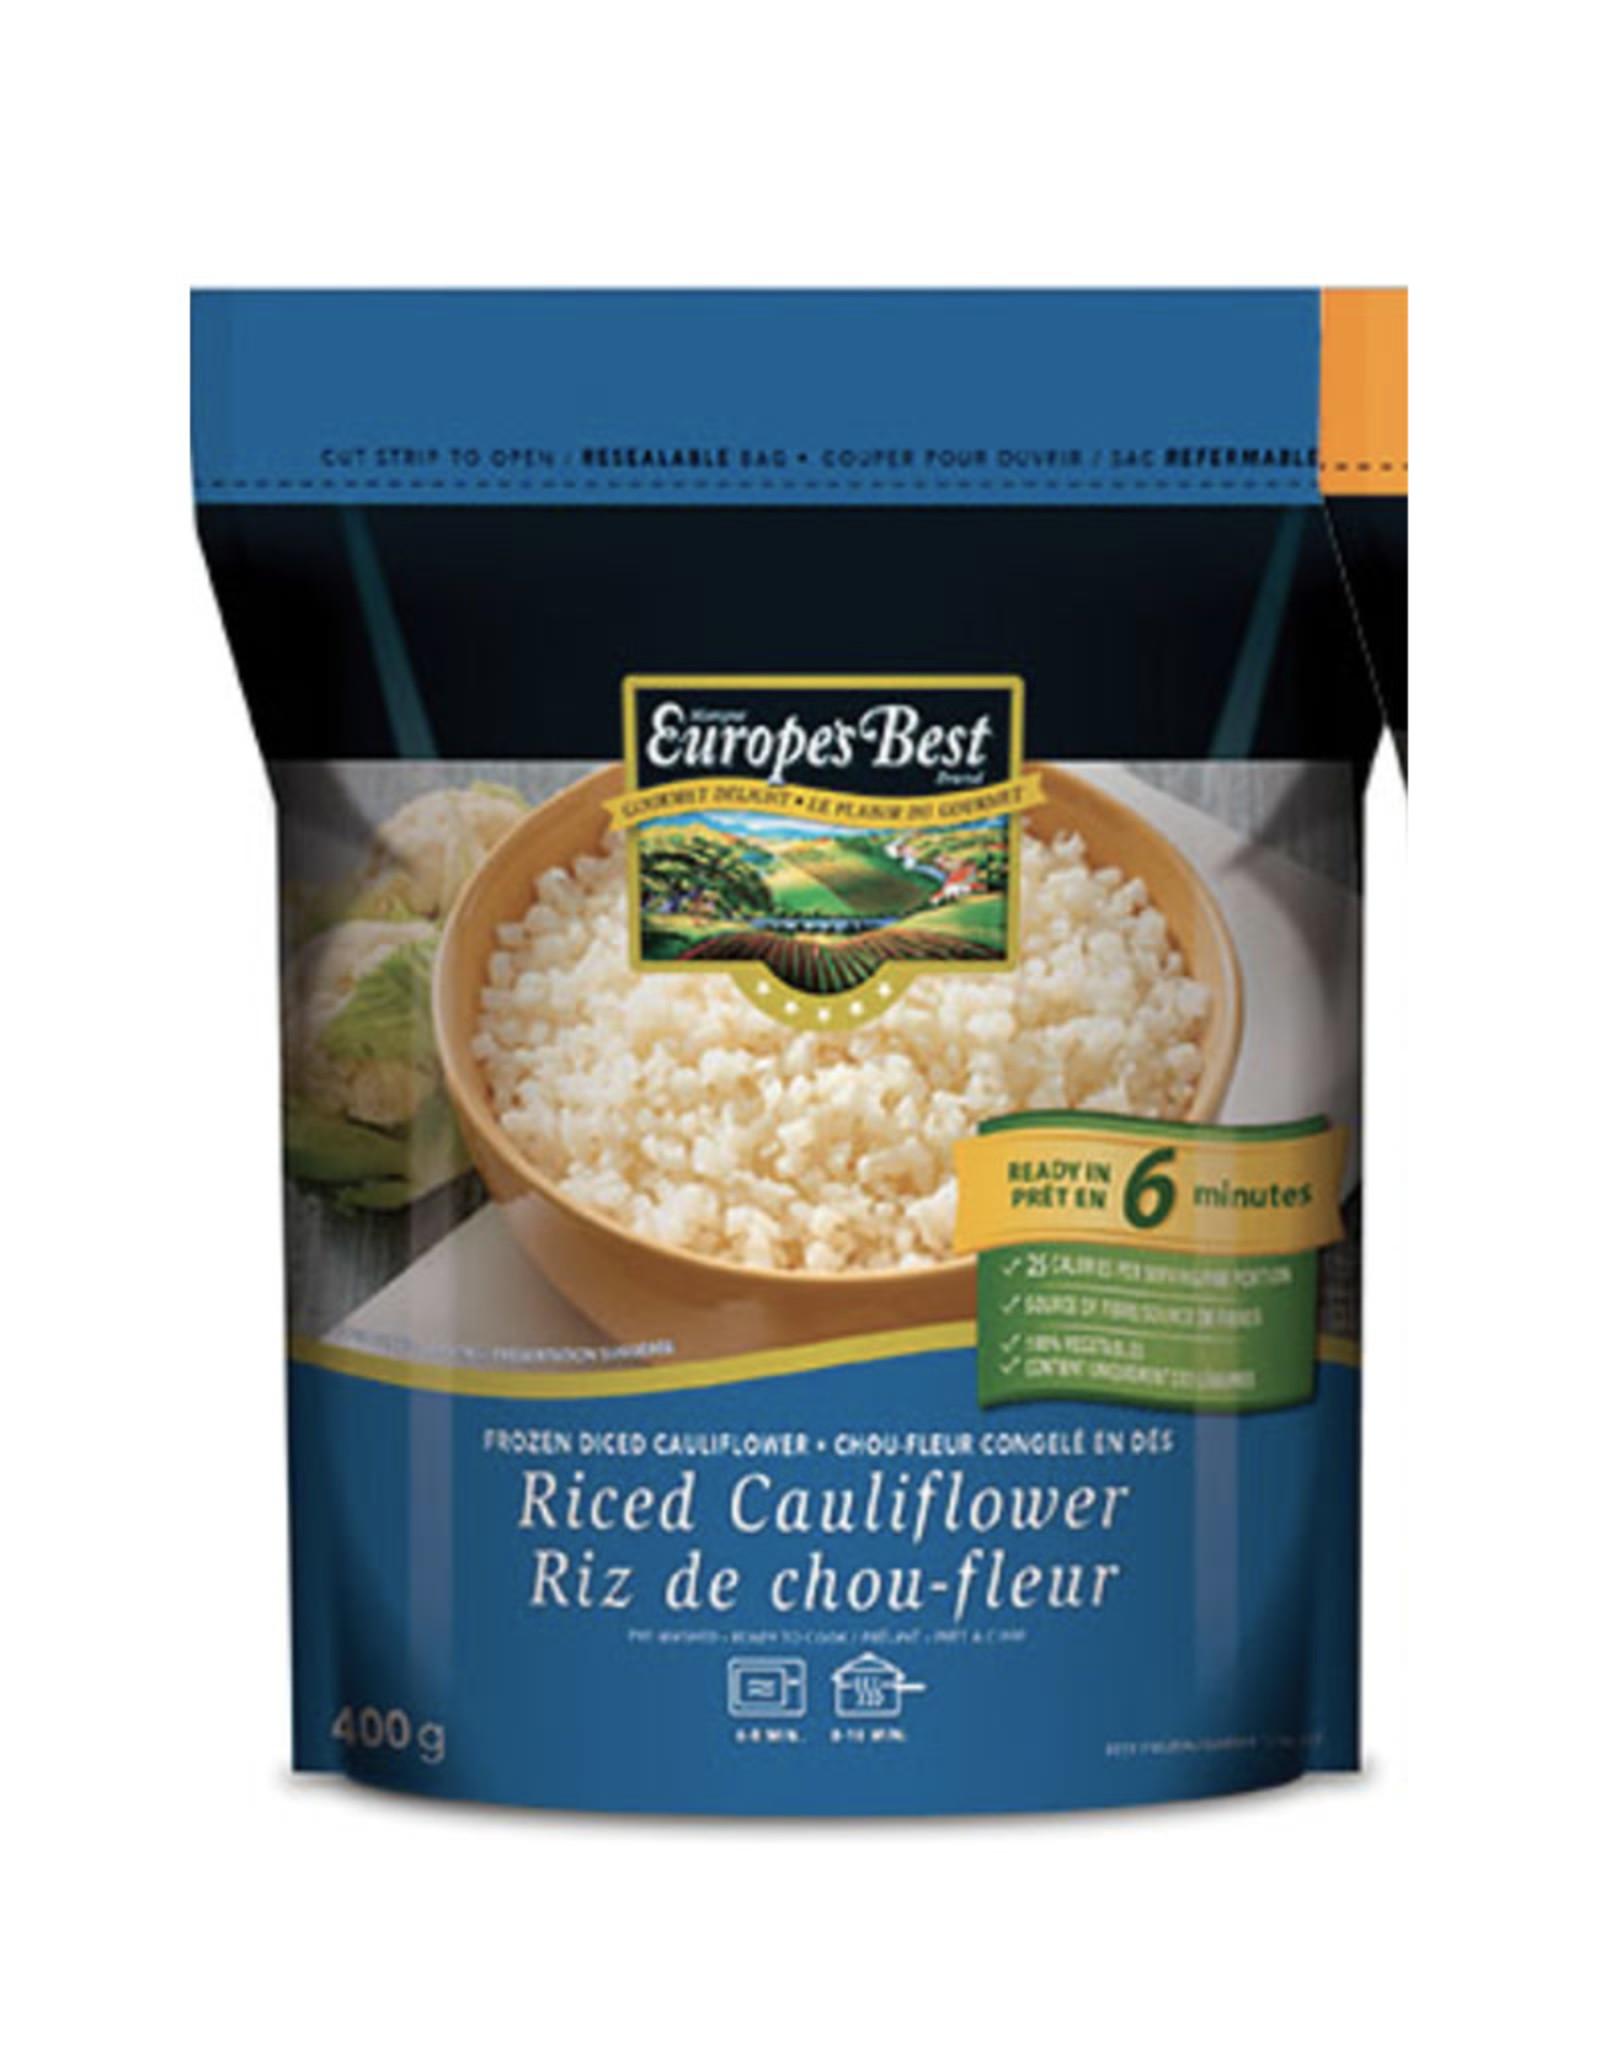 Europes Best Europes Best - Riced Cauliflower (400g)